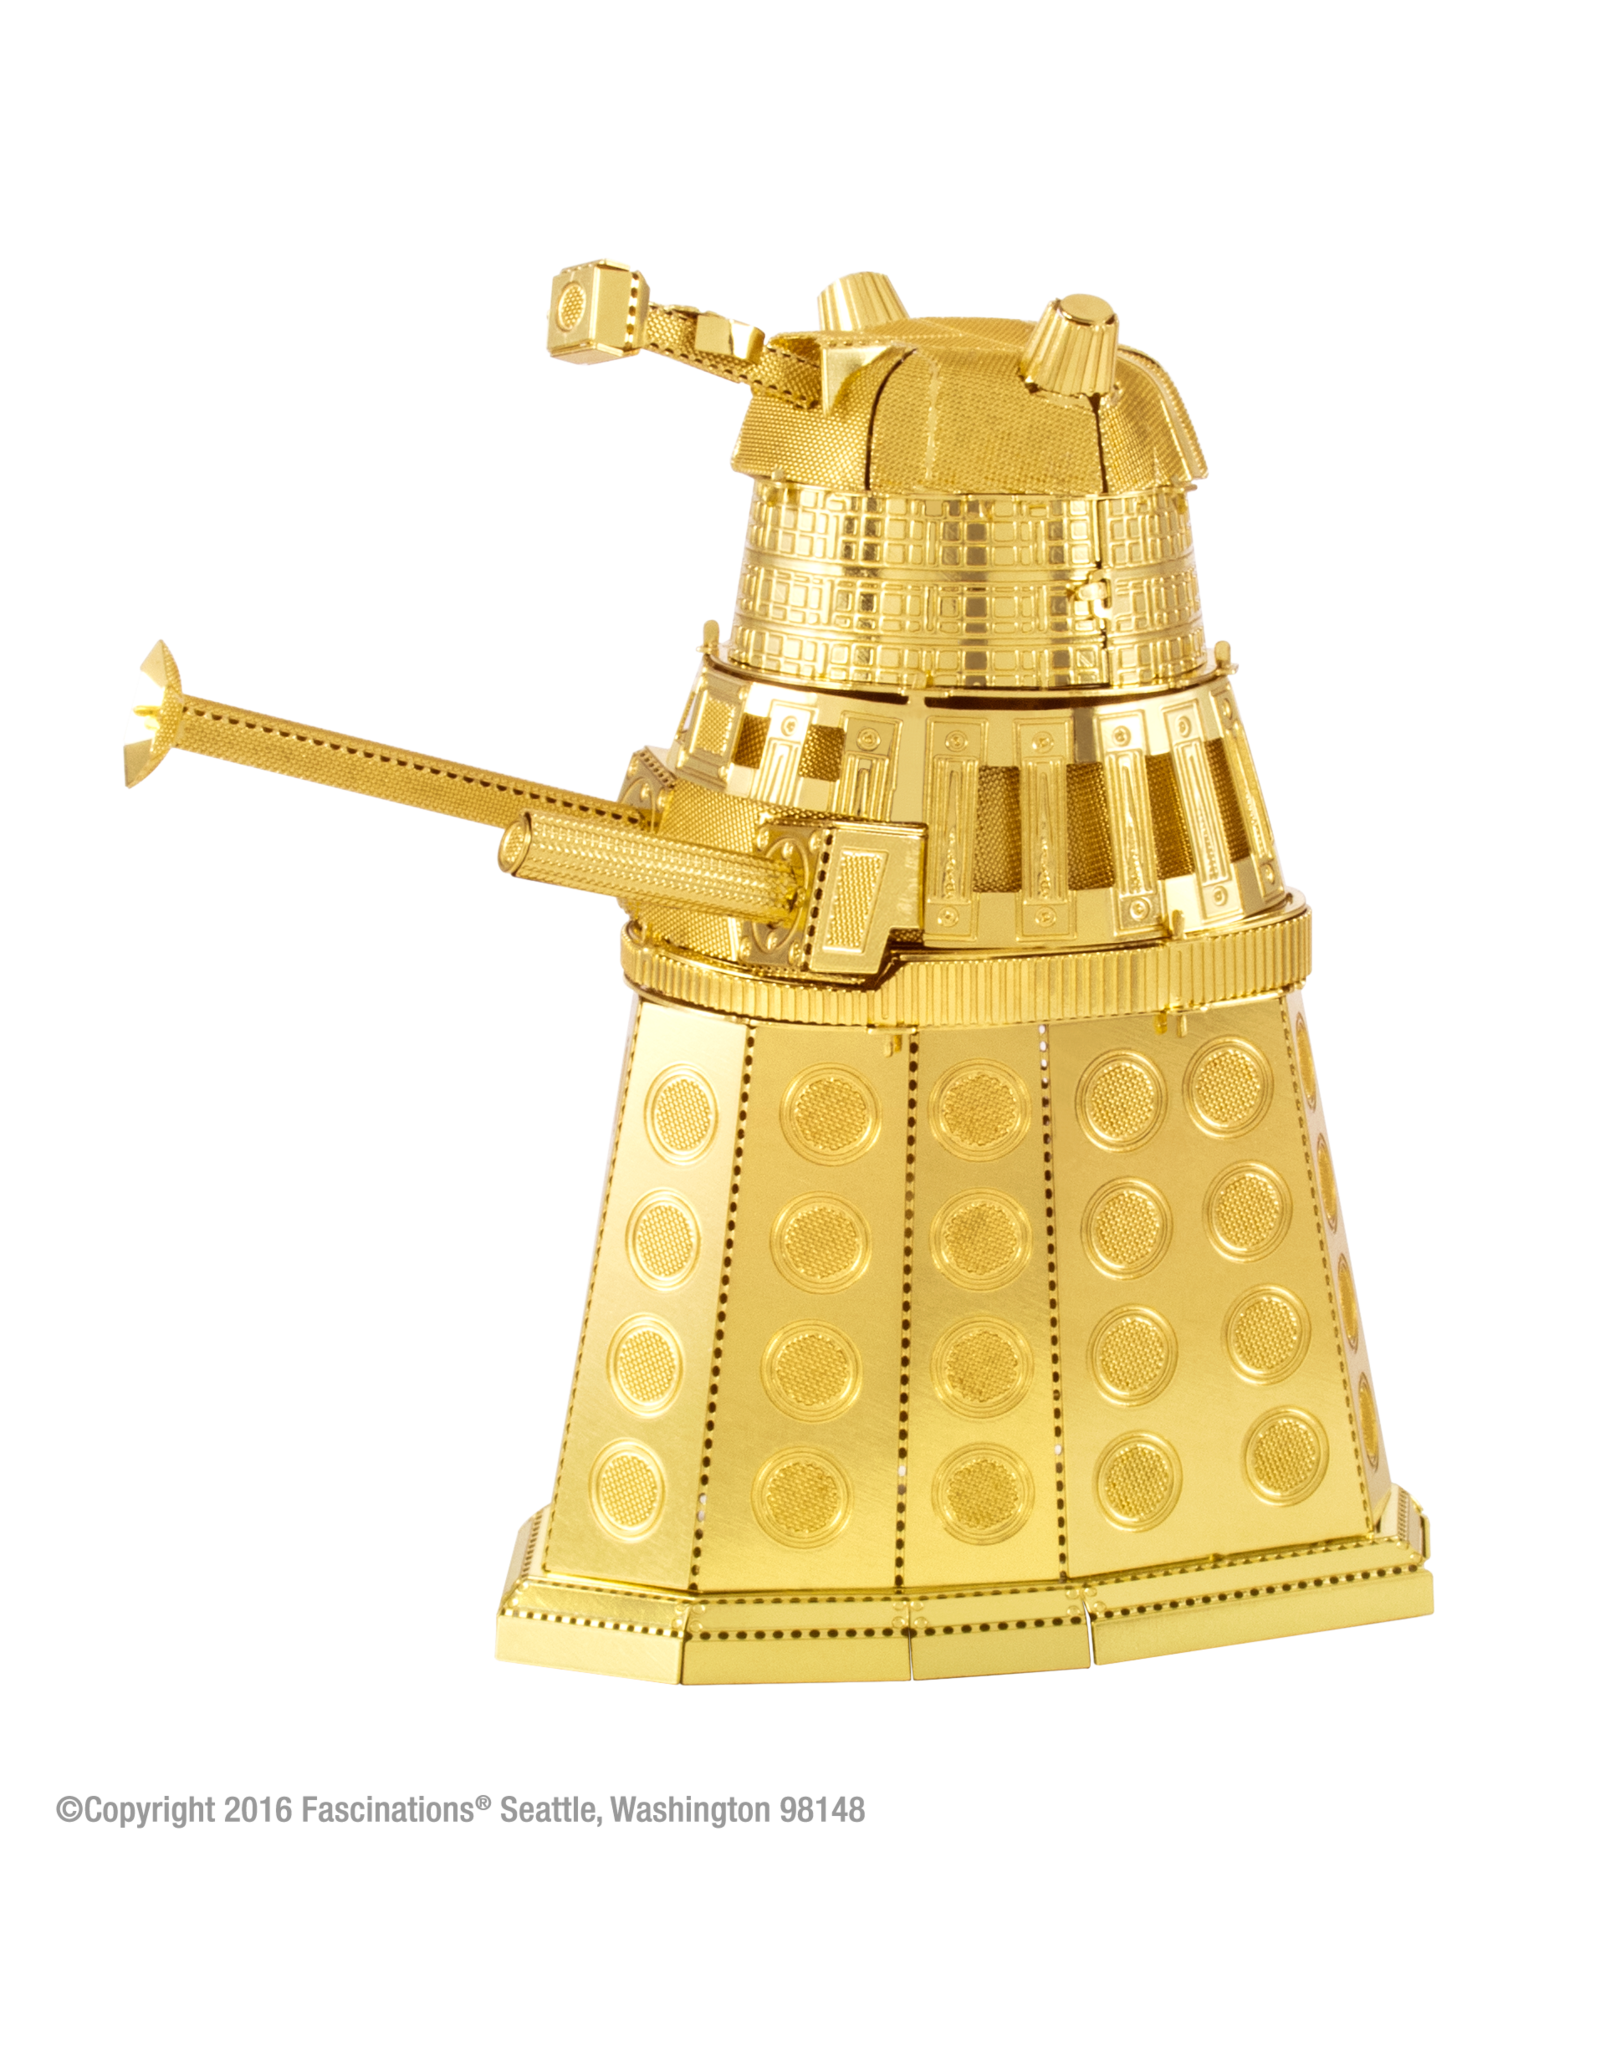 Fascinations Gold Dalek